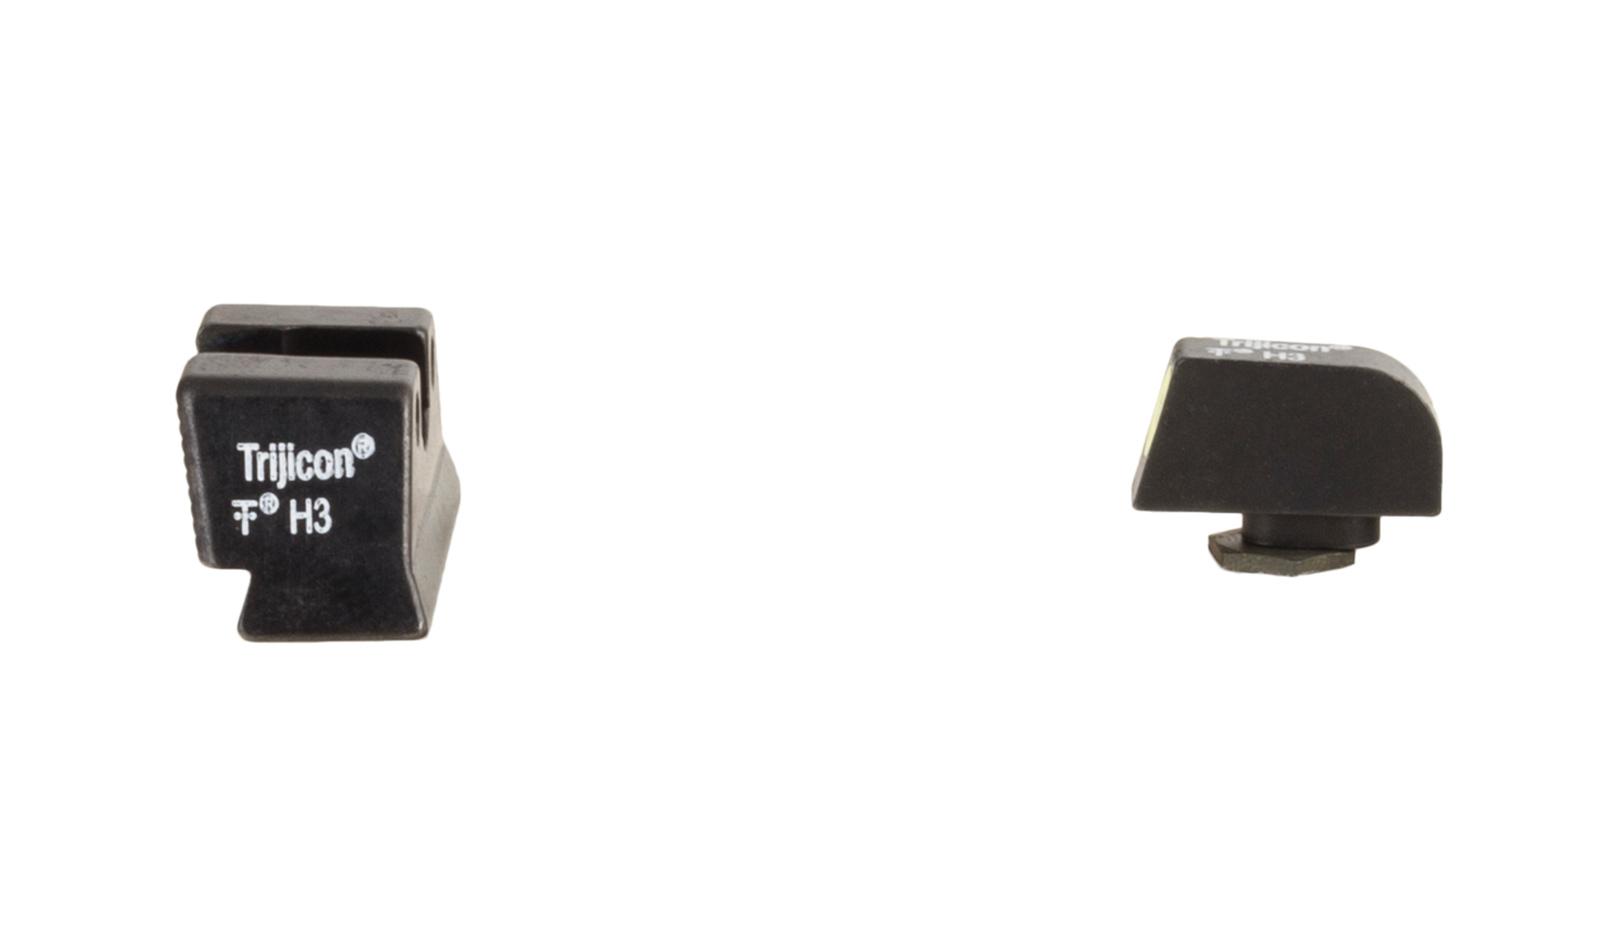 Trijicon HD™ Night Sights - Glock Standard Frames (MOS) Bild 2